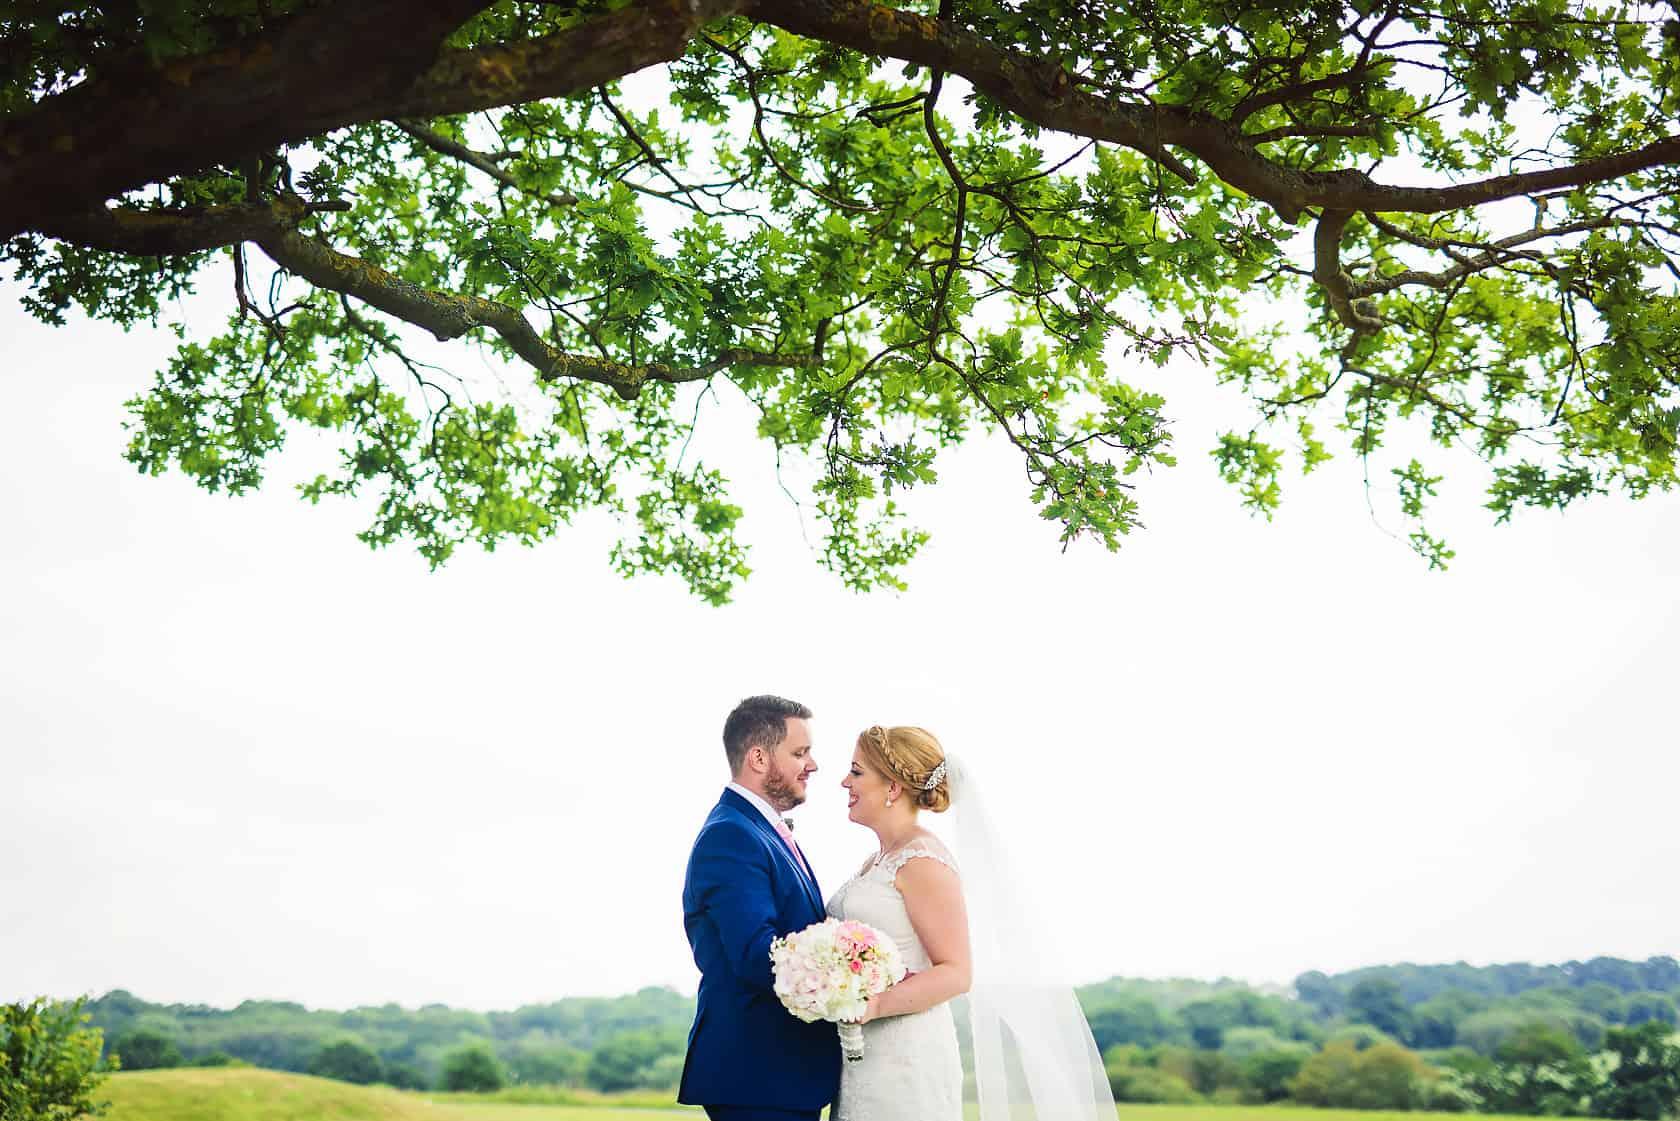 Best_Wedding_Photography_2018_Wedding-Photographer-Essex-and-London_057